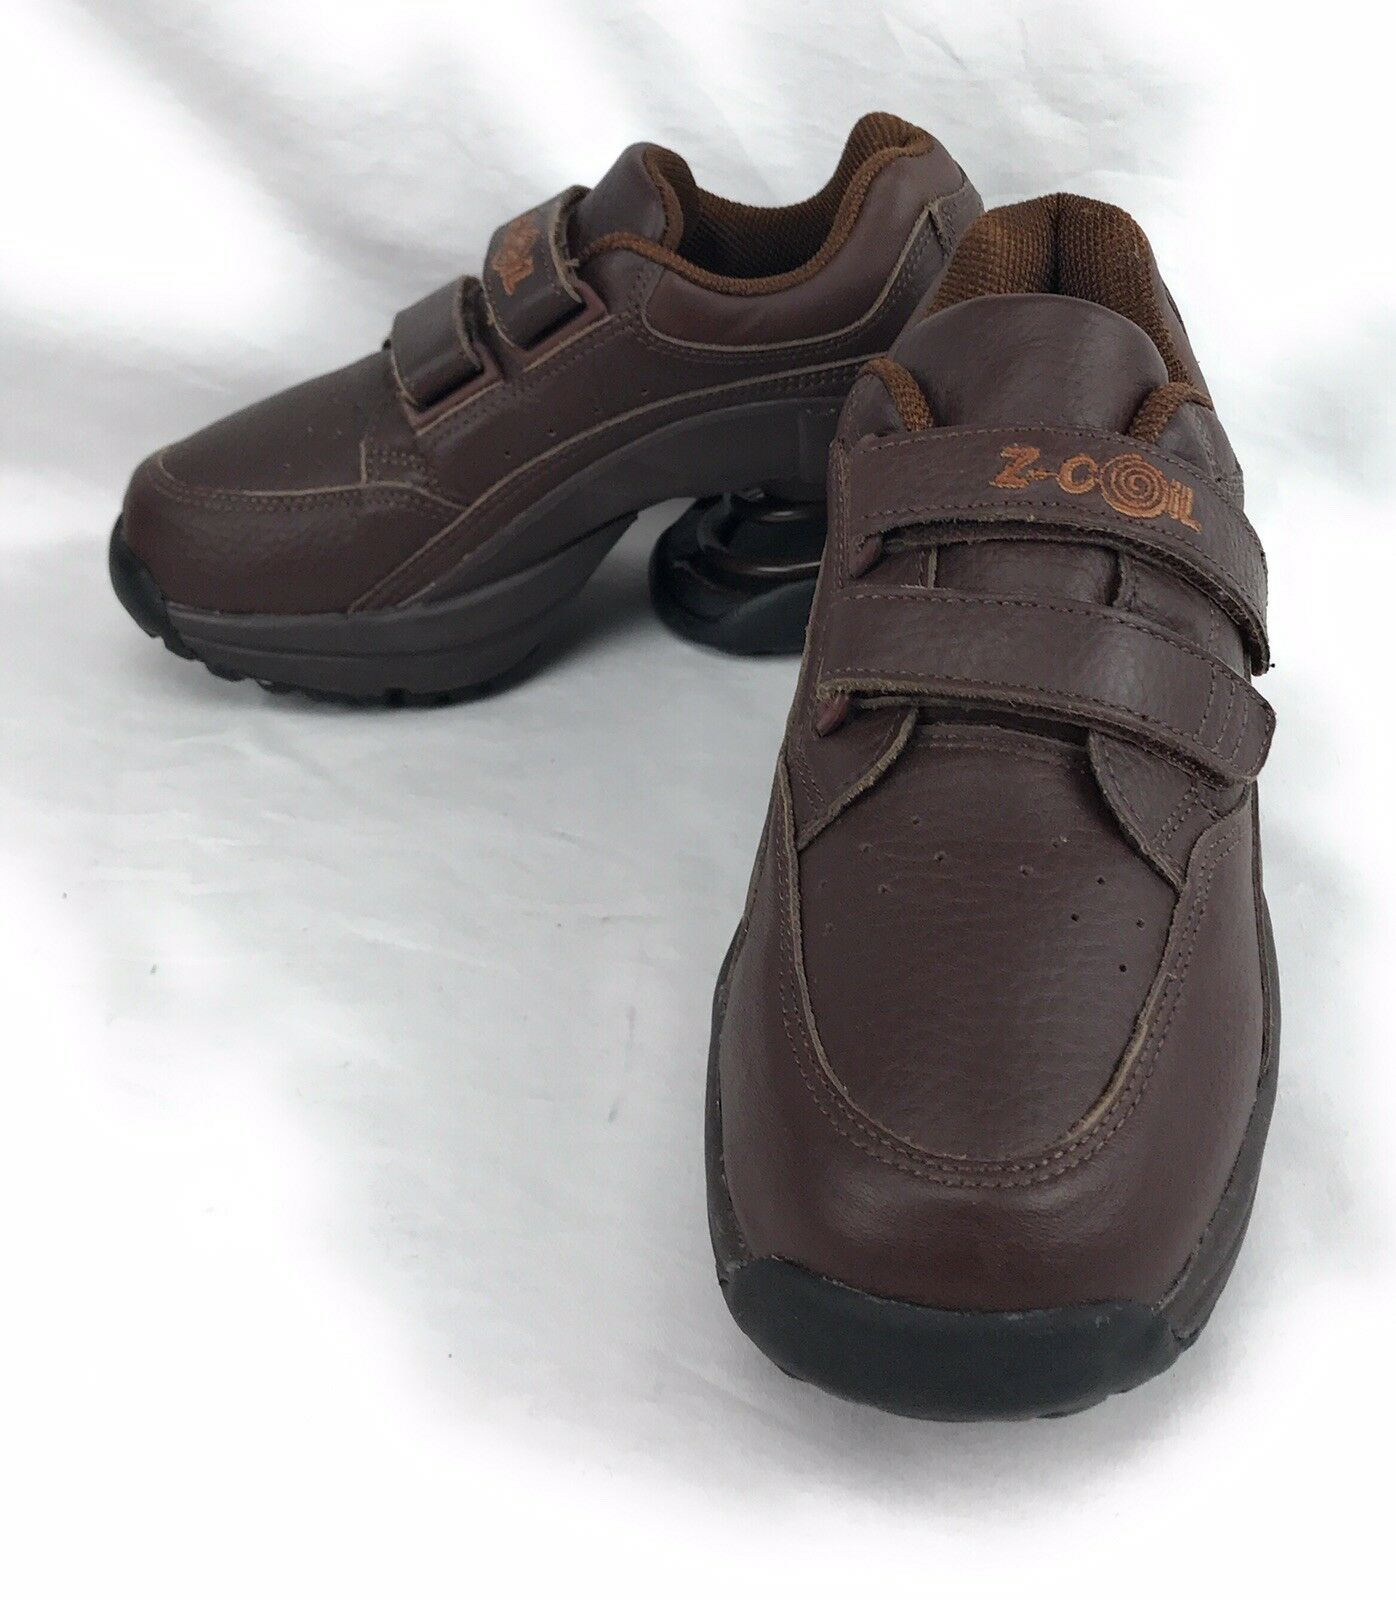 Z Coil Cloud Cloud Cloud Walker W6  Hook Loop Brown Leather shoes EU 36.5 UK 3.5 CM 23 9fdf40